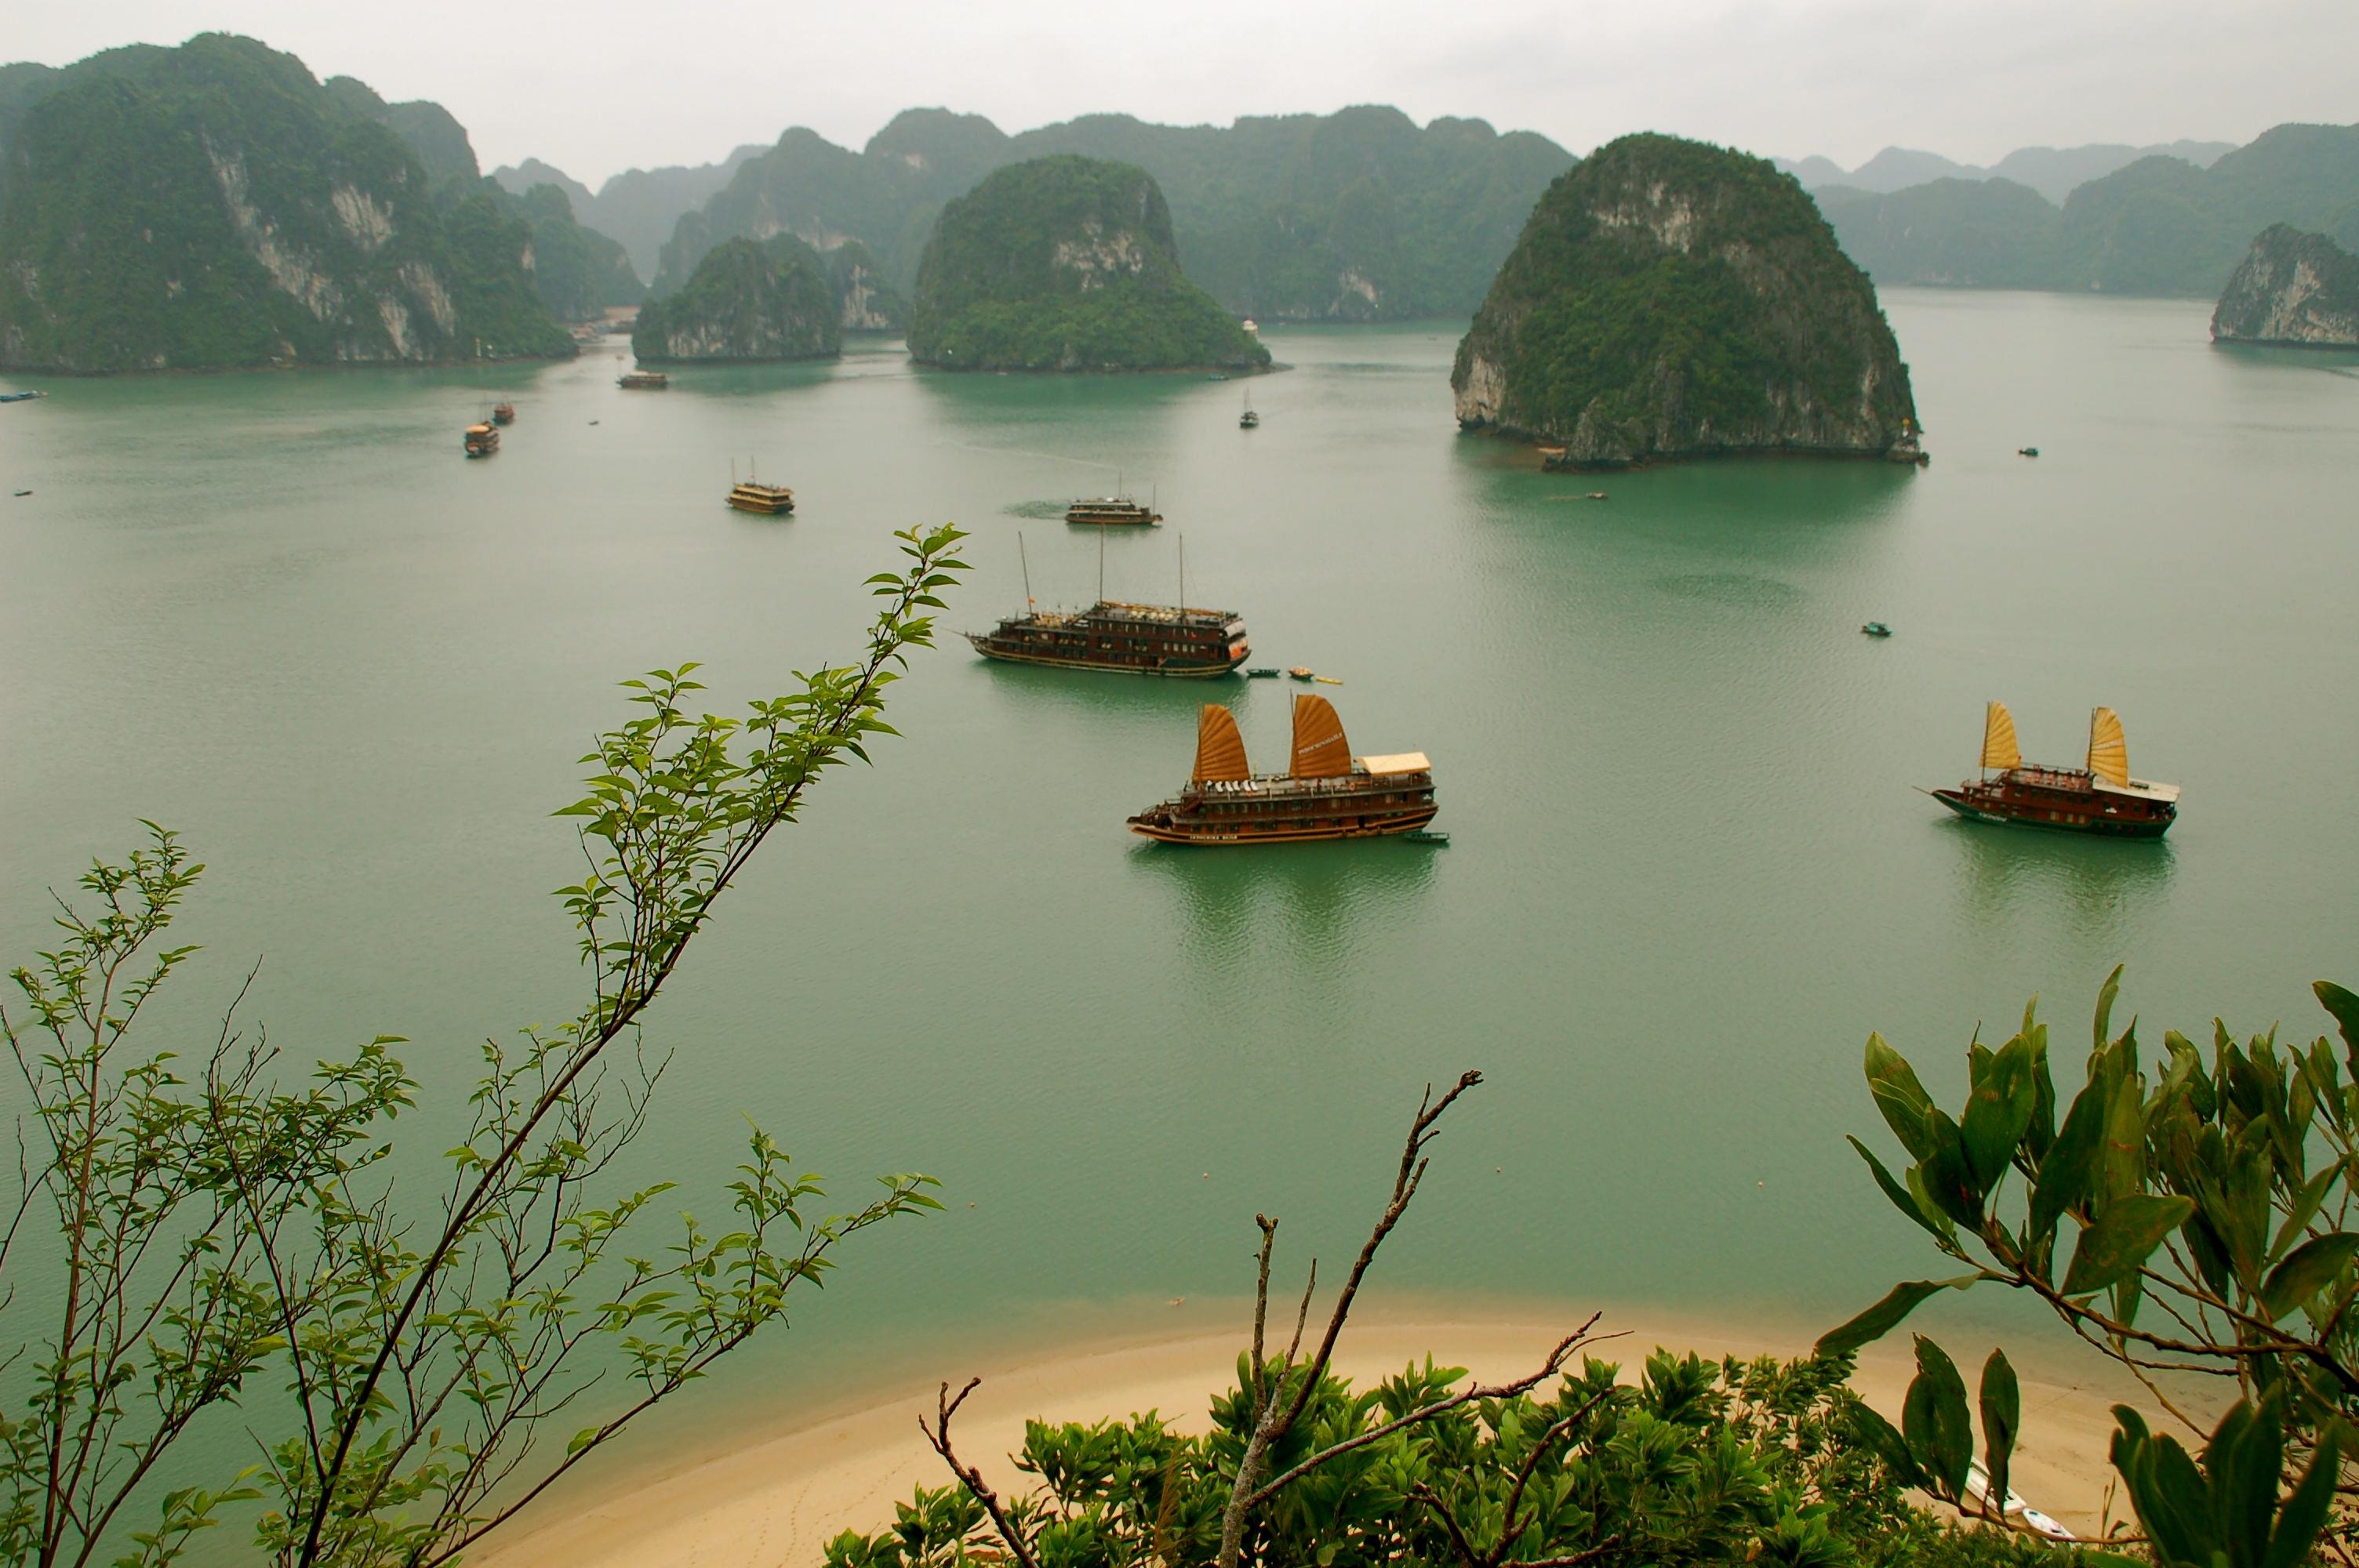 Balade au Vietnam hors des sentiers battus